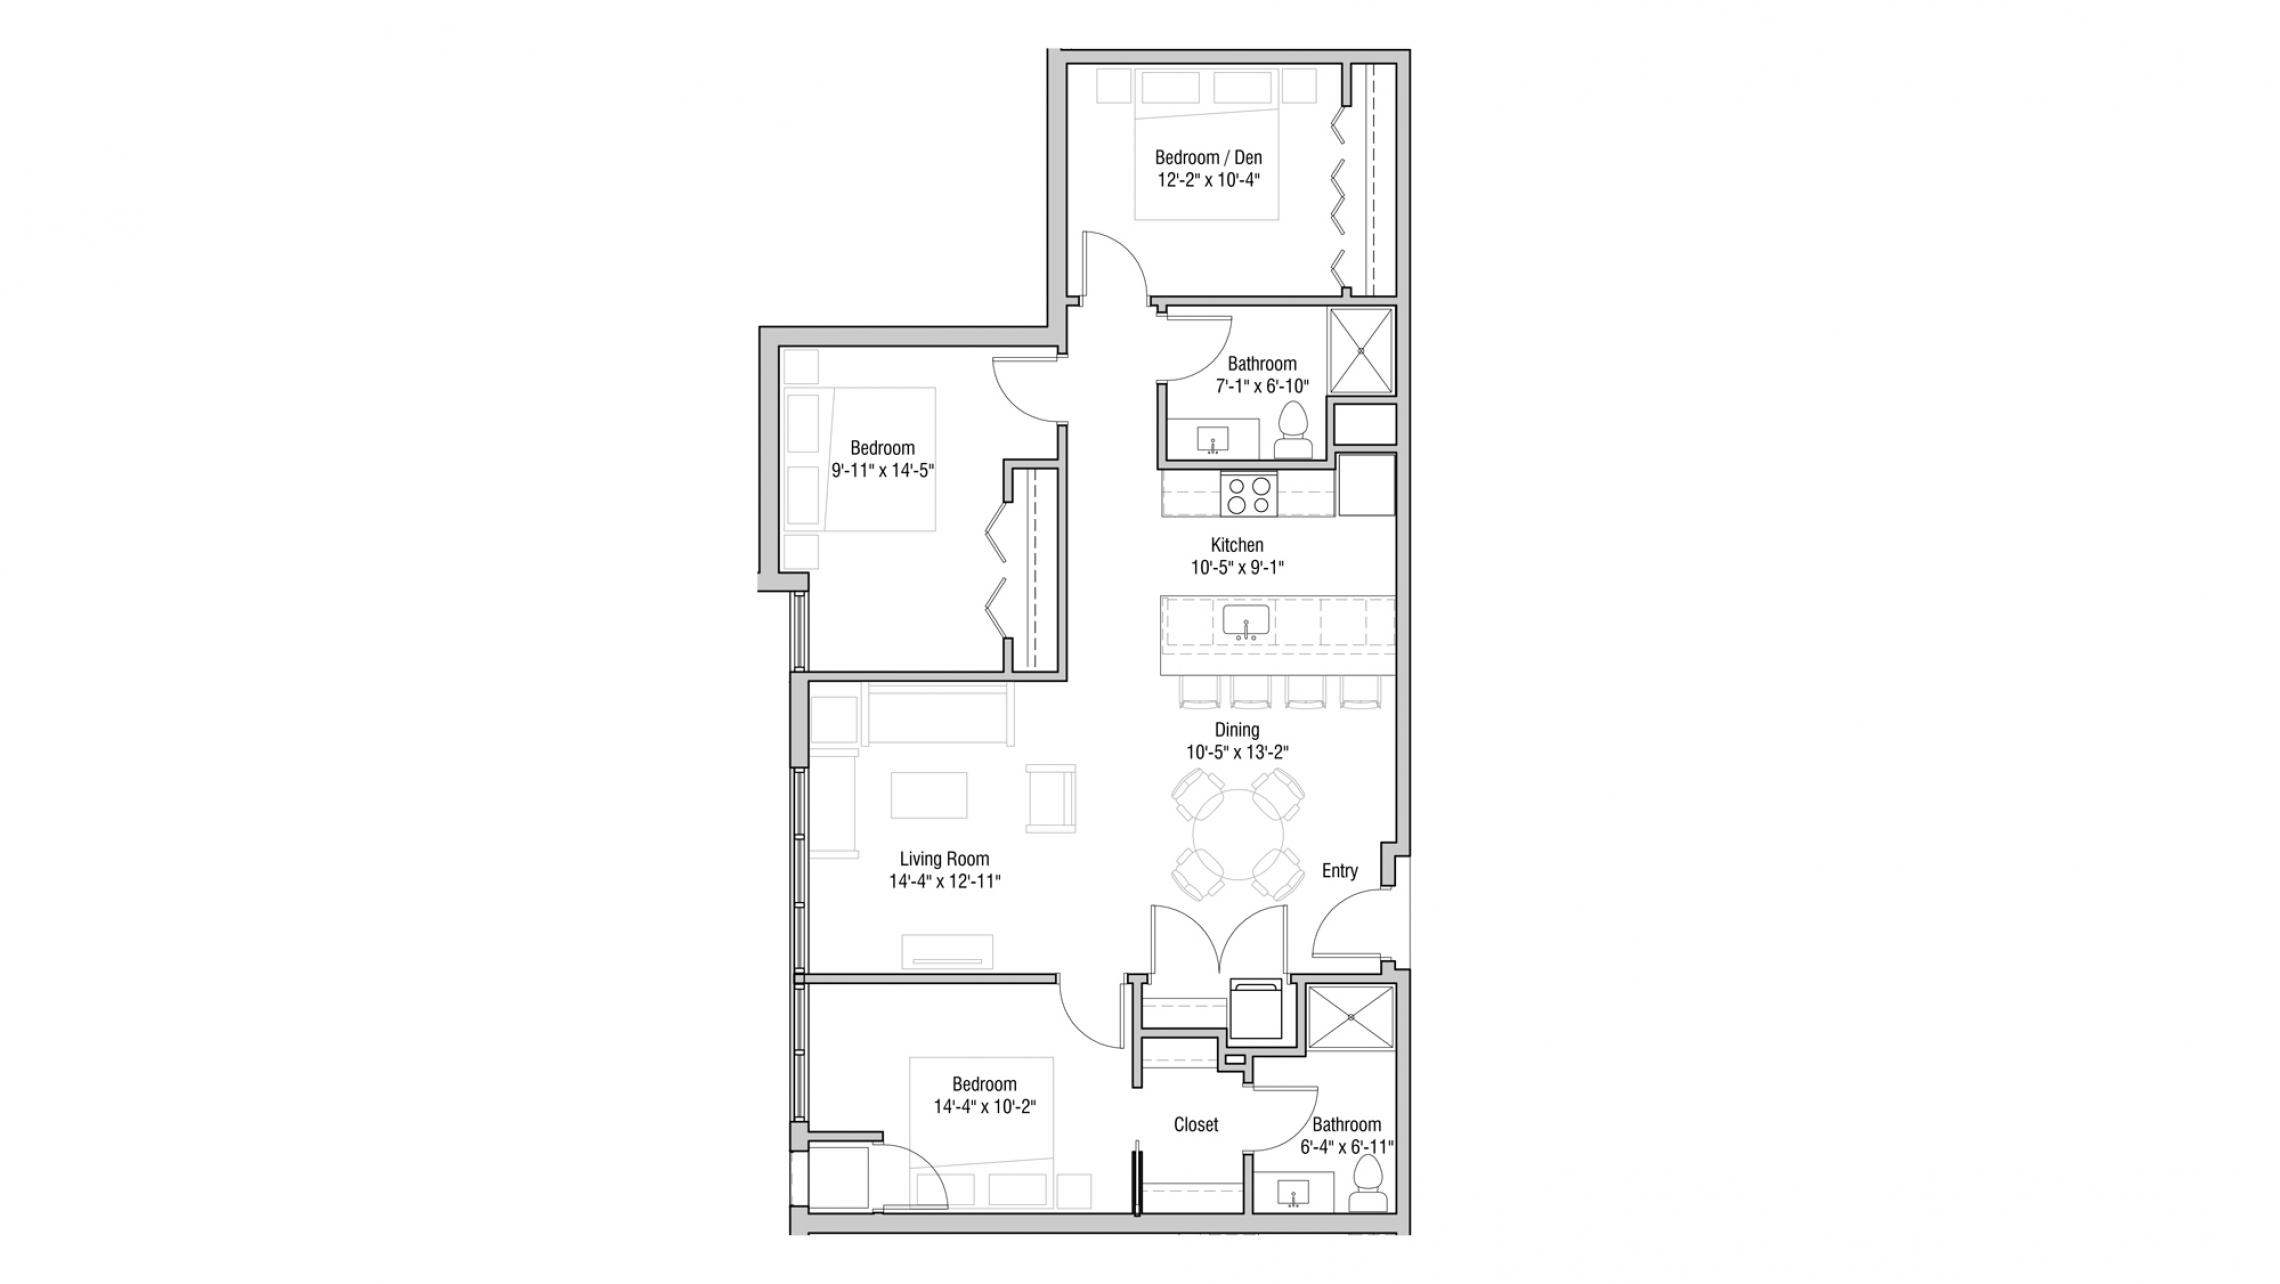 ULI Quarter Row 310 - Two Bedroom, Two Bathroom